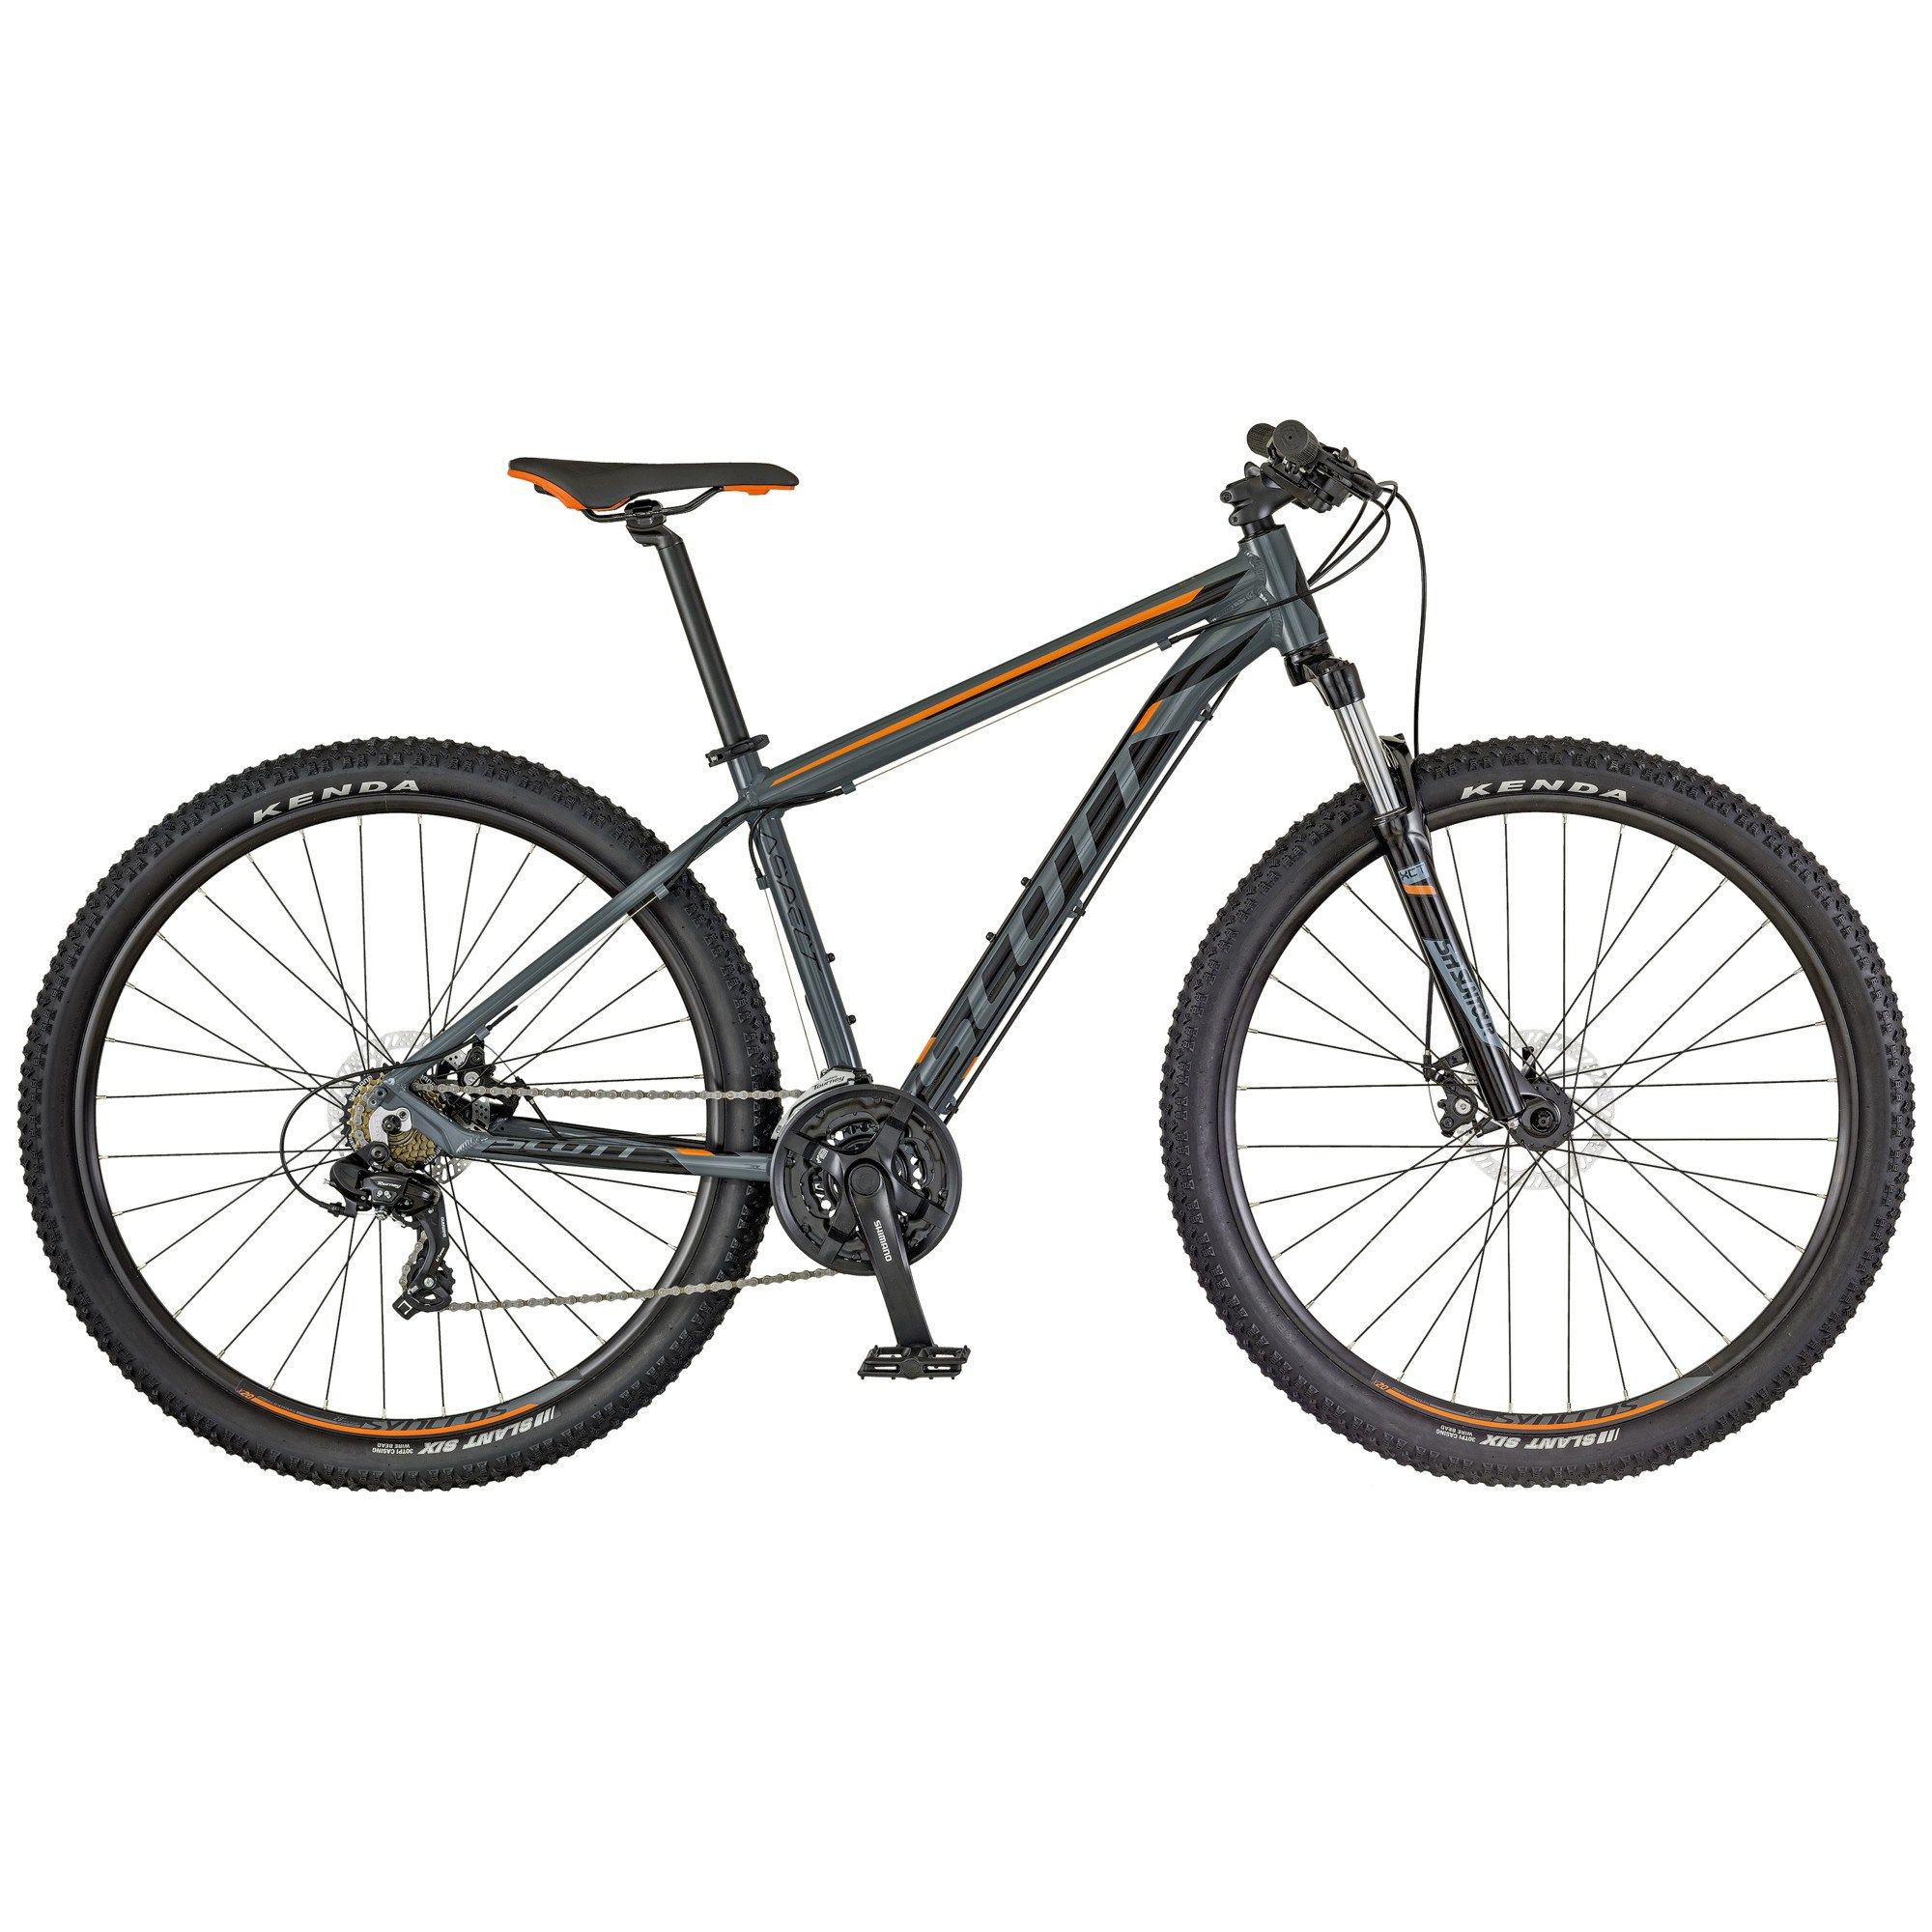 Scott Aspect 970mountain Cbi Bikes Mountain Bikes Cycling And